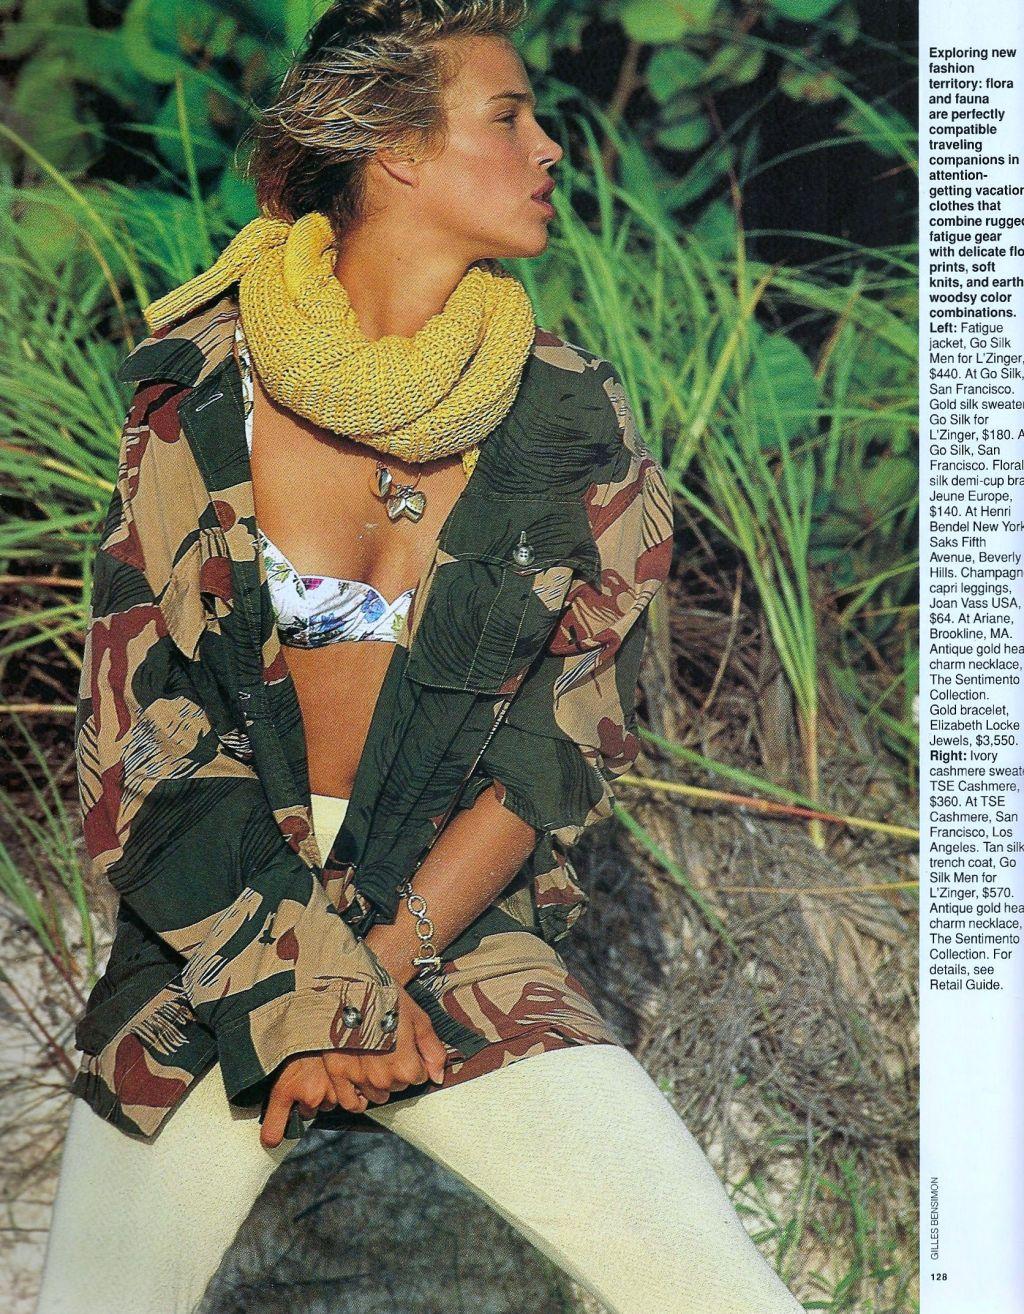 Elle (US) January 1991 | Tropical 05.jpg